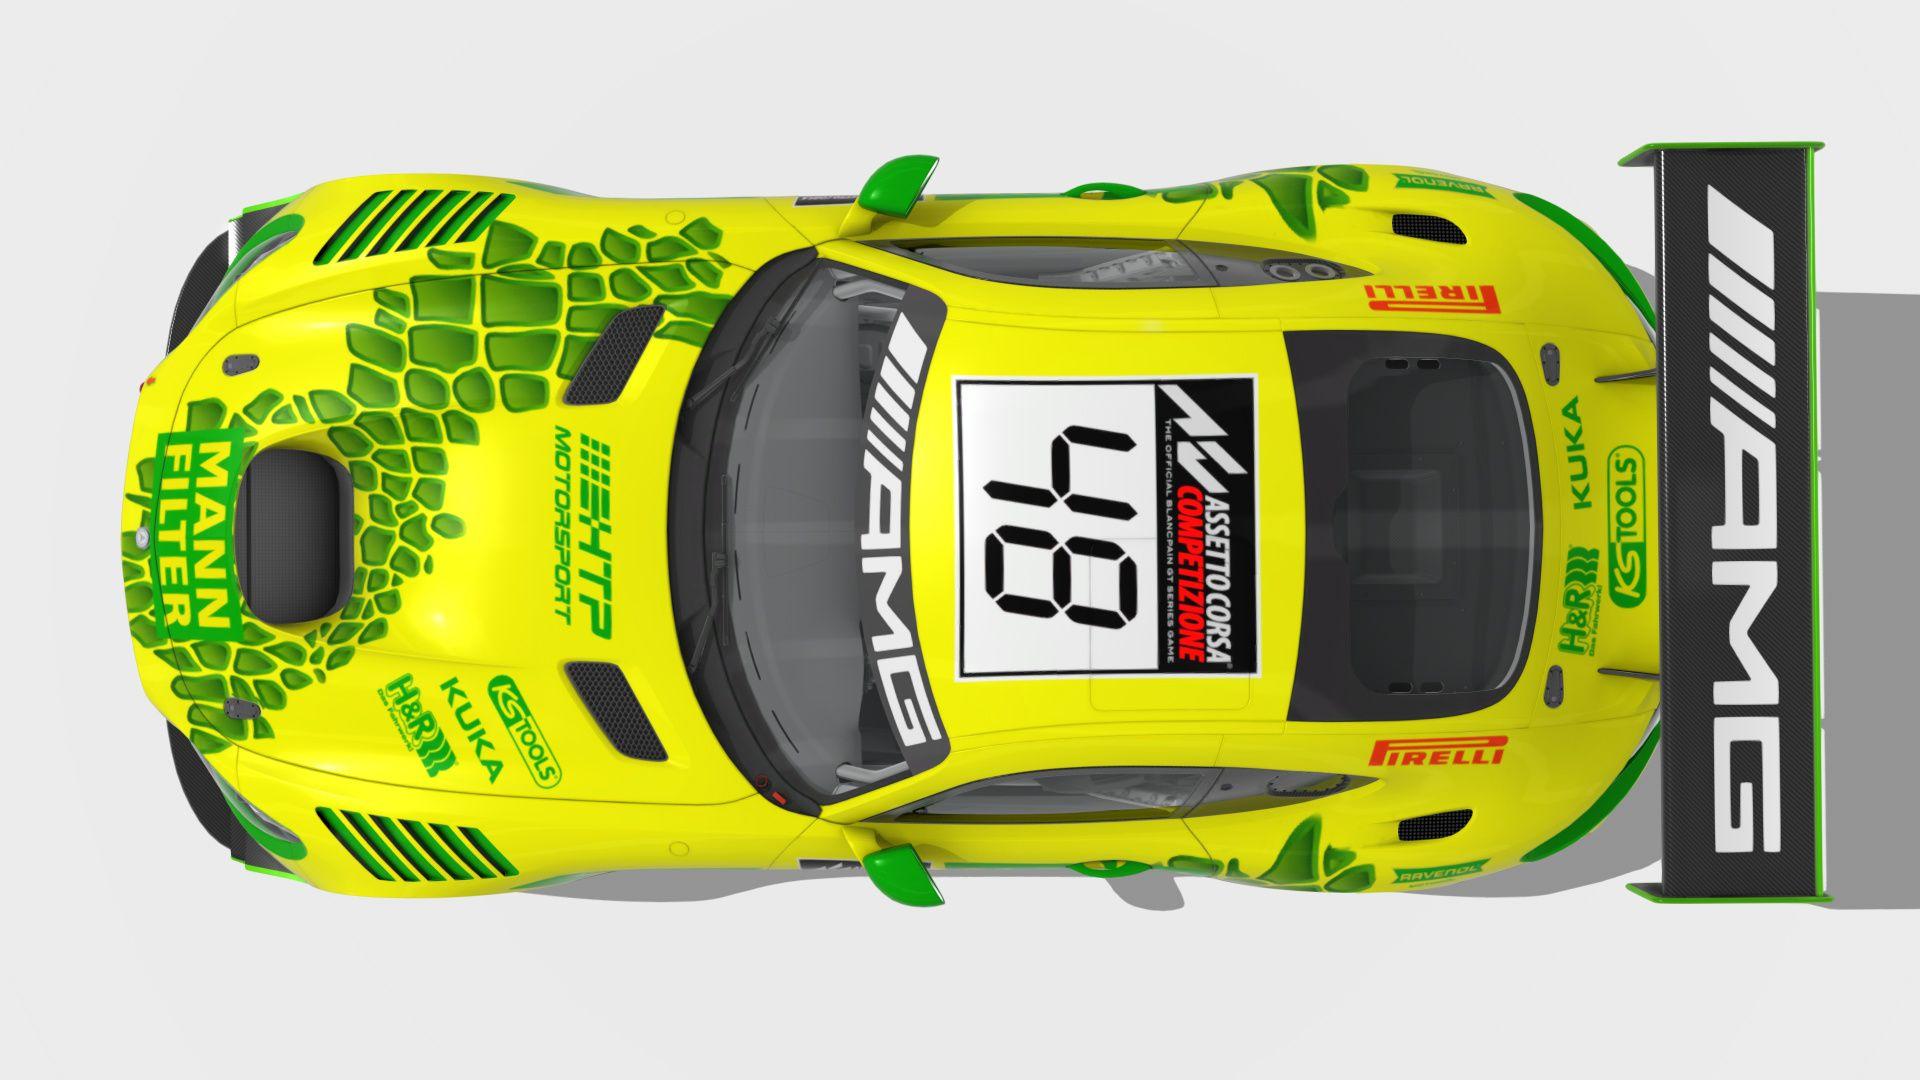 Design Entwurf Mann Filter Amg Gt3 Amg Gt3 Sport Cars